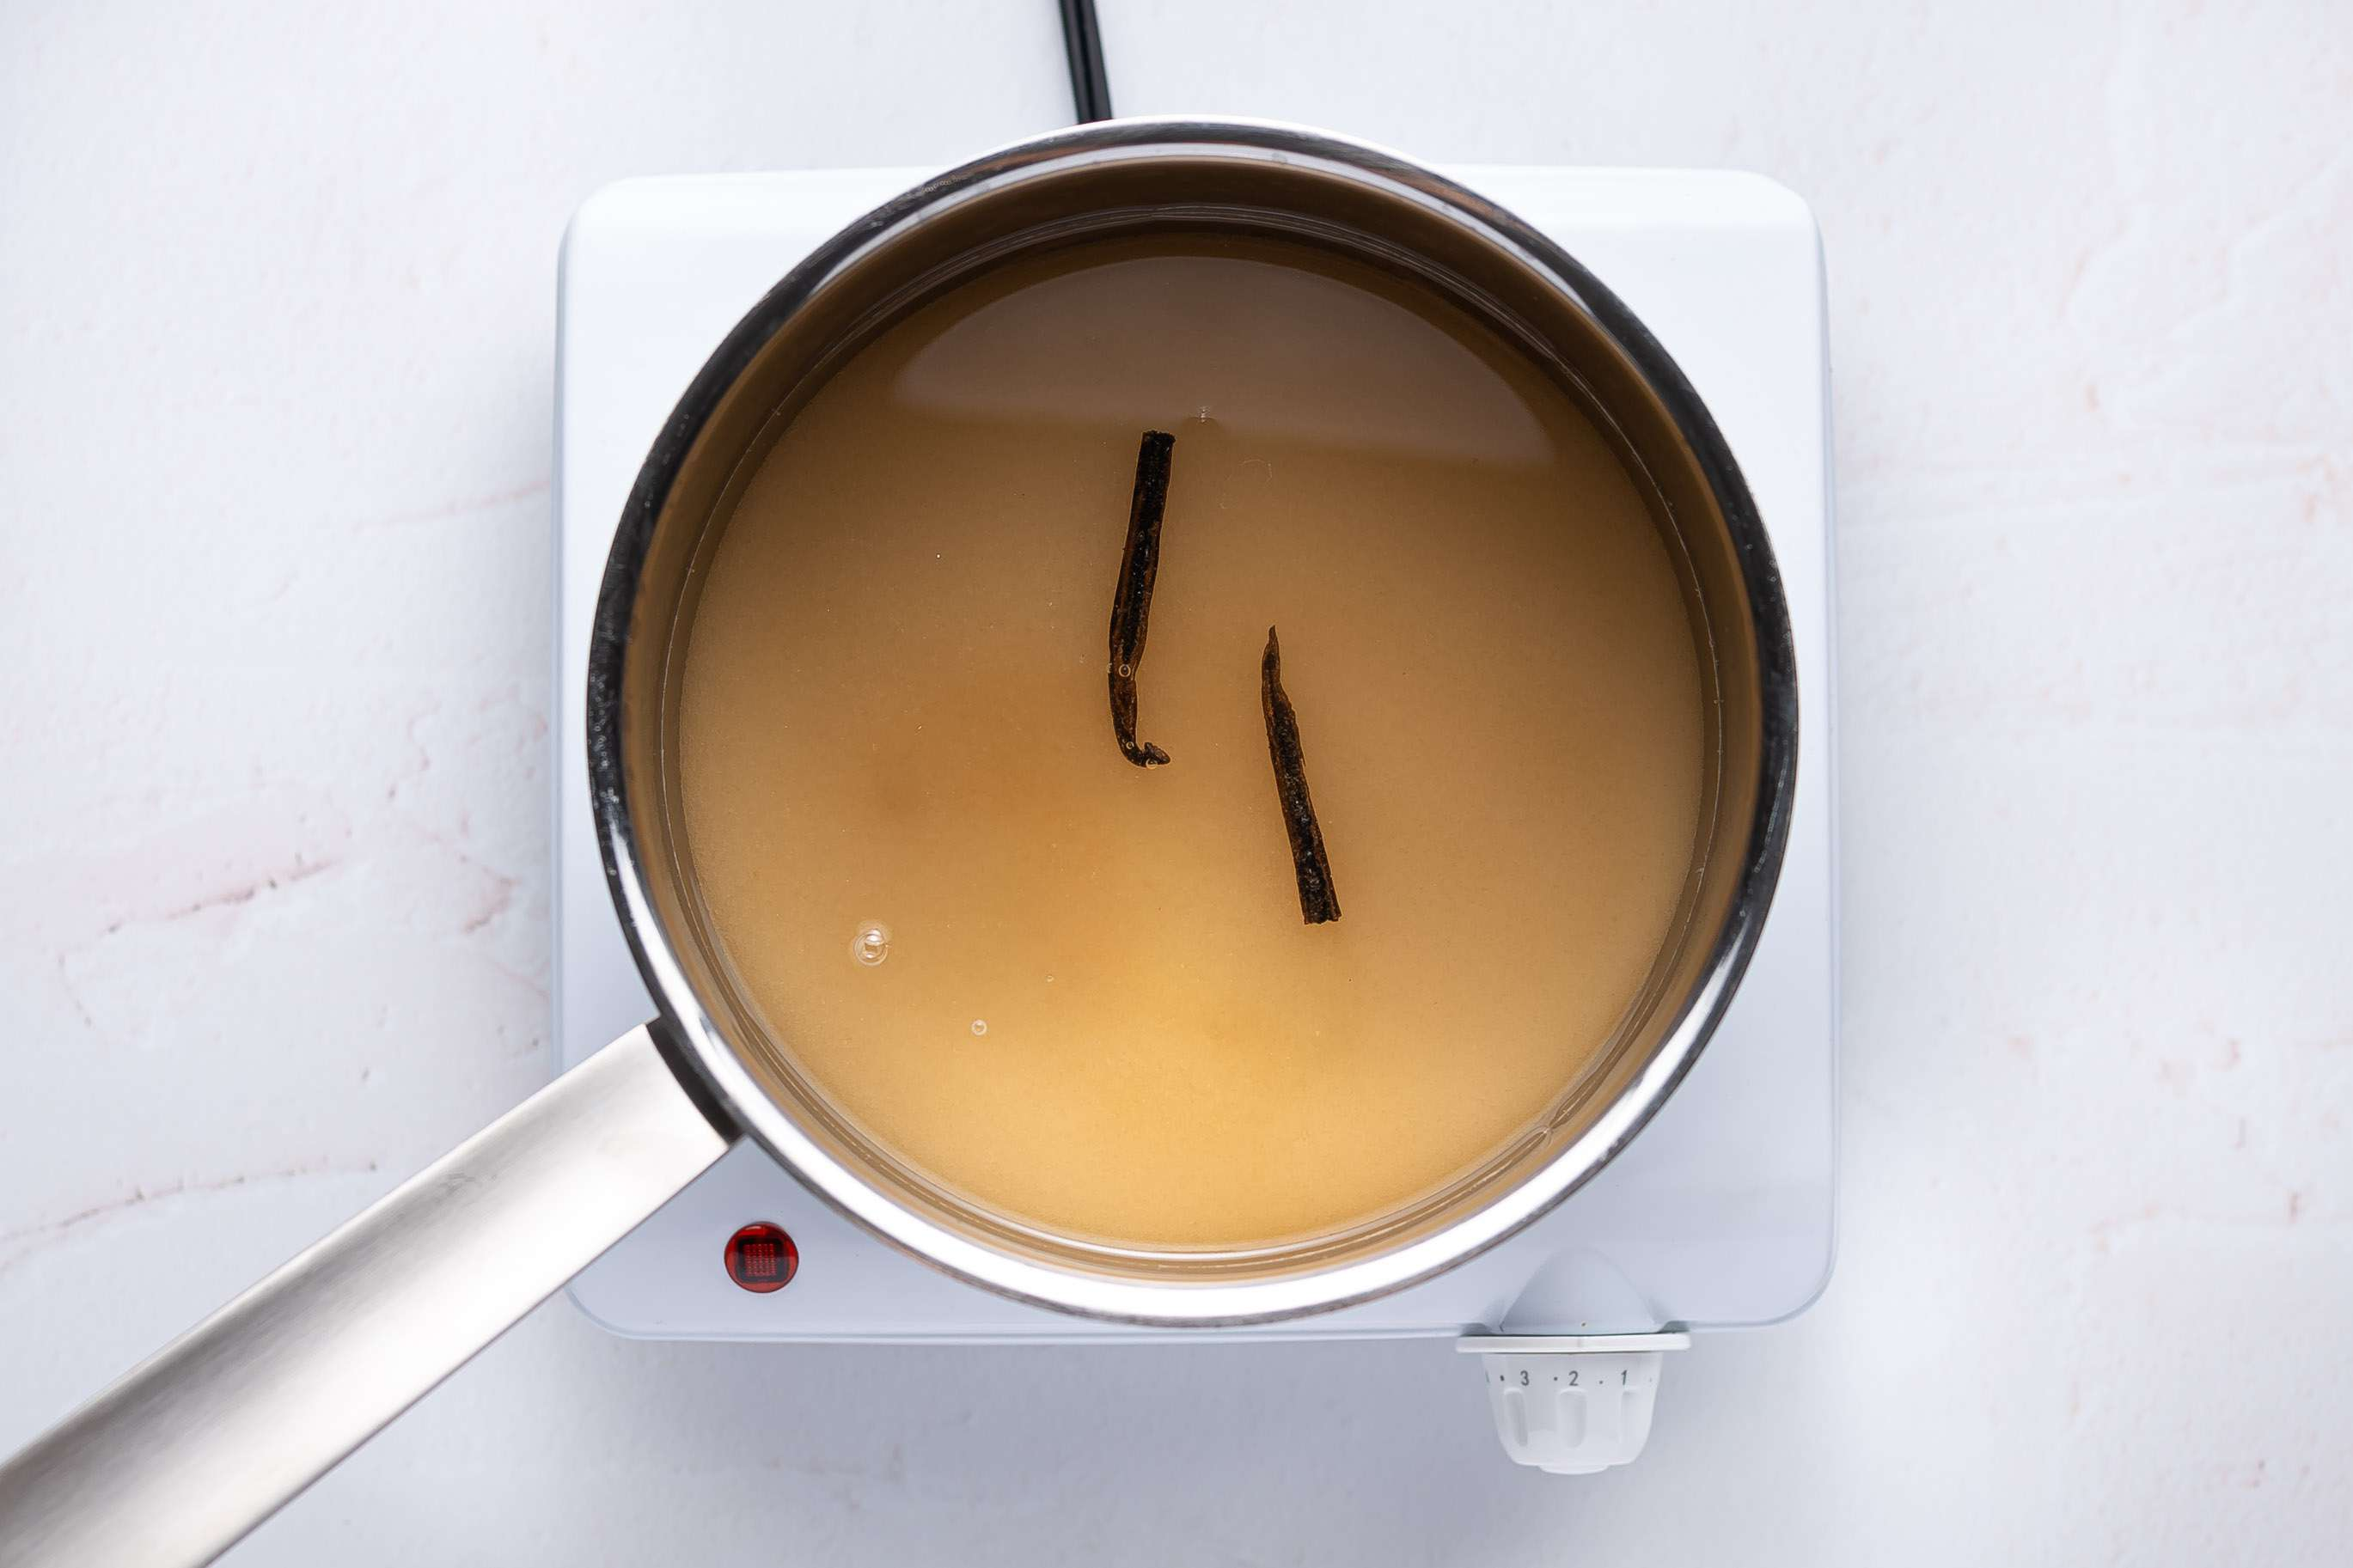 combine the sugar, water, and vanilla in a saucepan